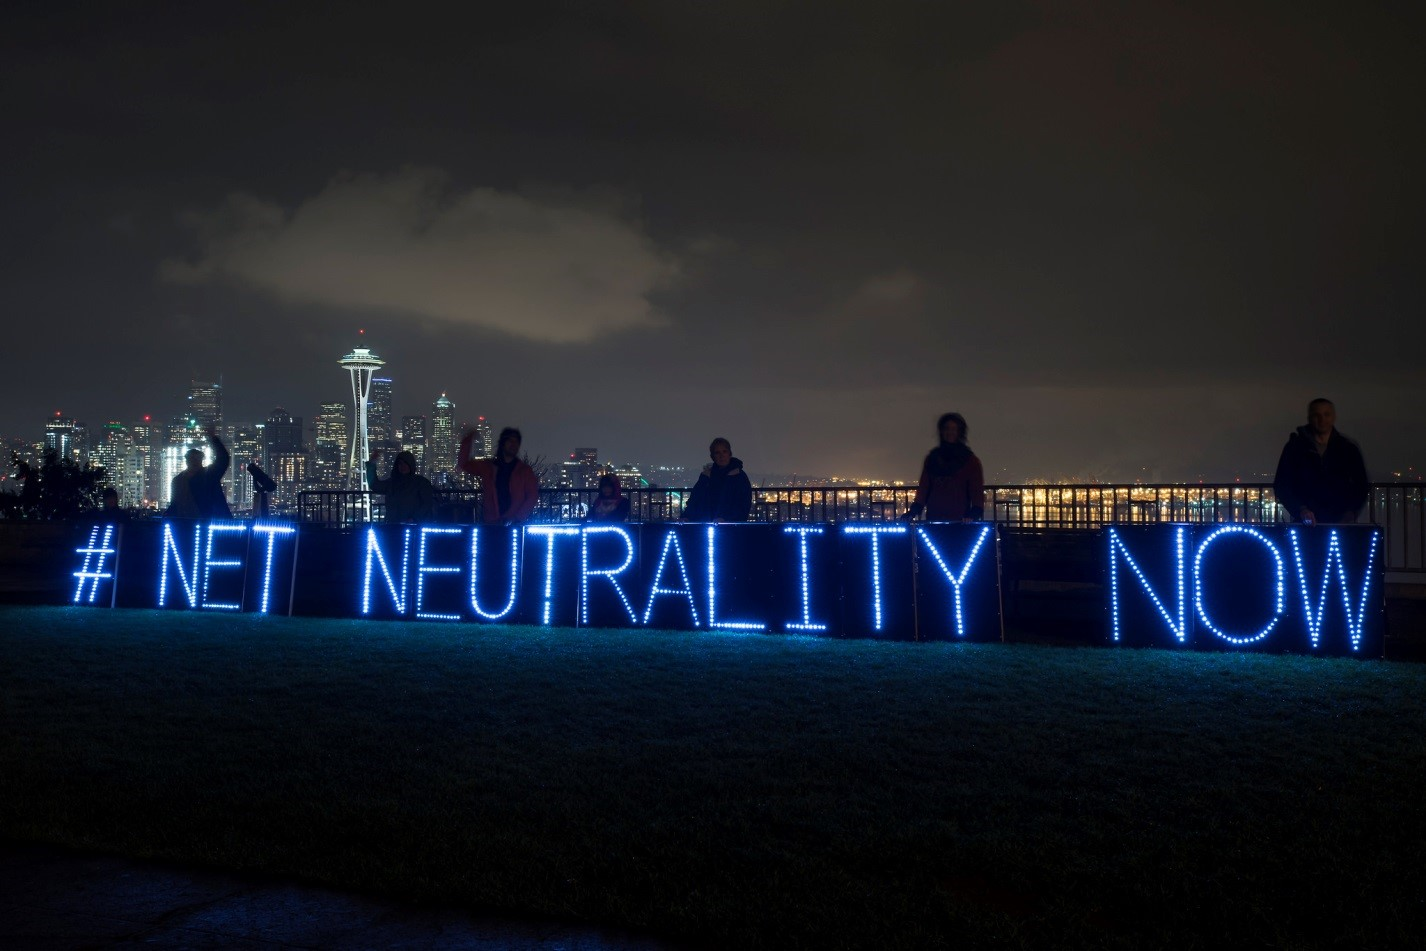 Битва за сетевой нейтралитет: история вопроса - 1